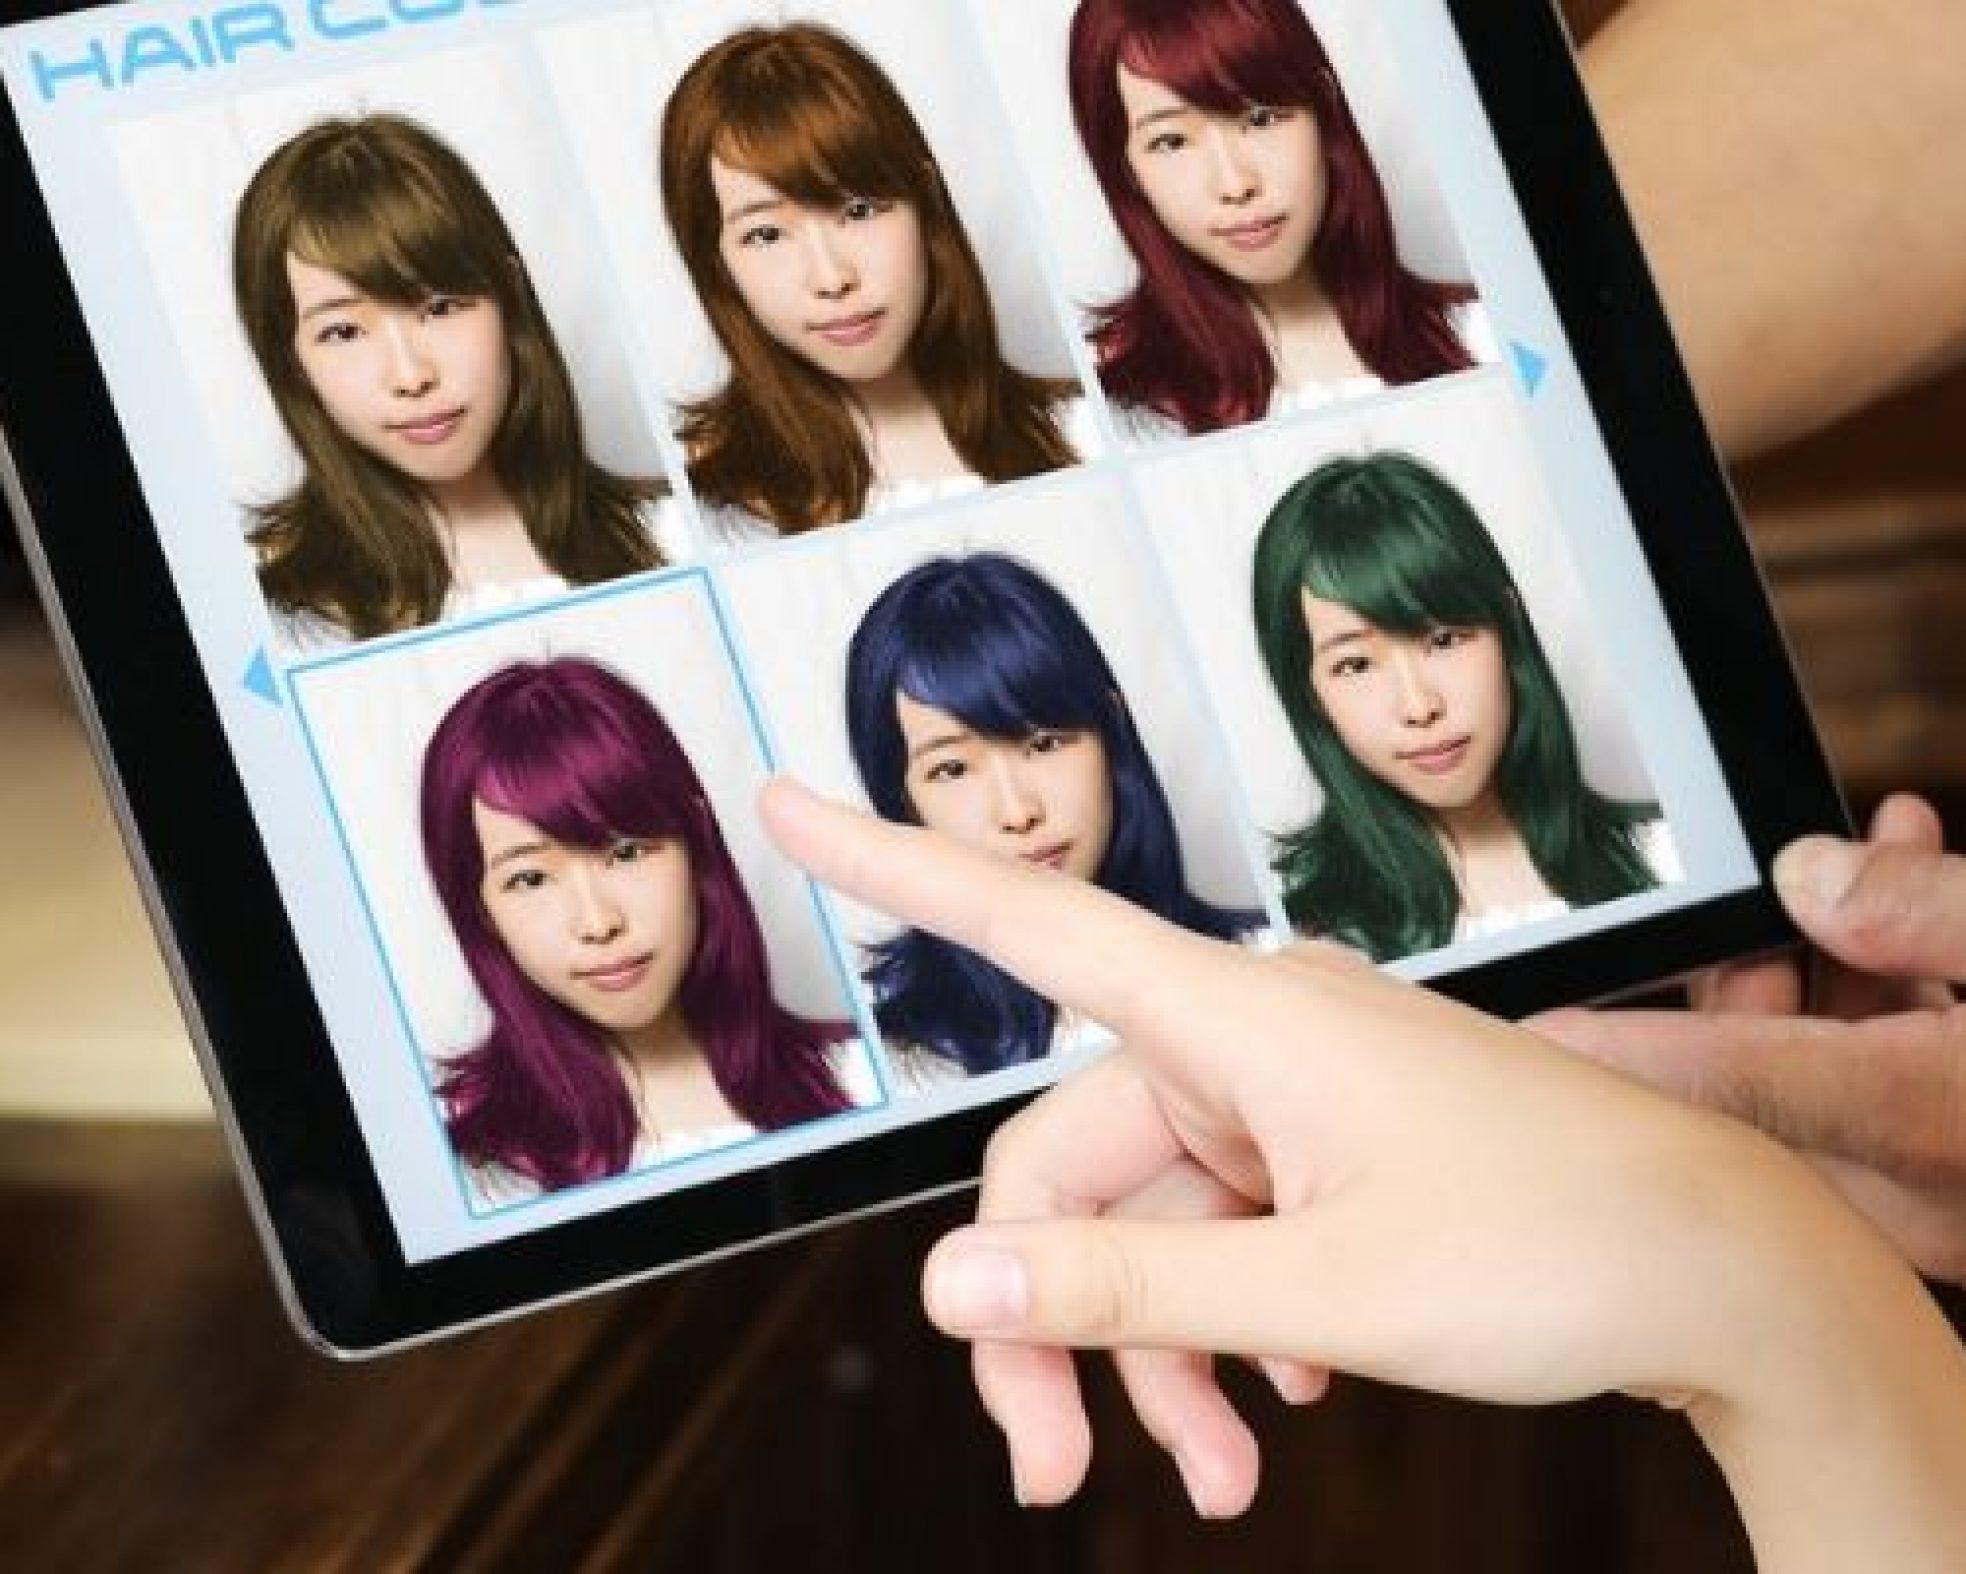 Hairdressing Apps